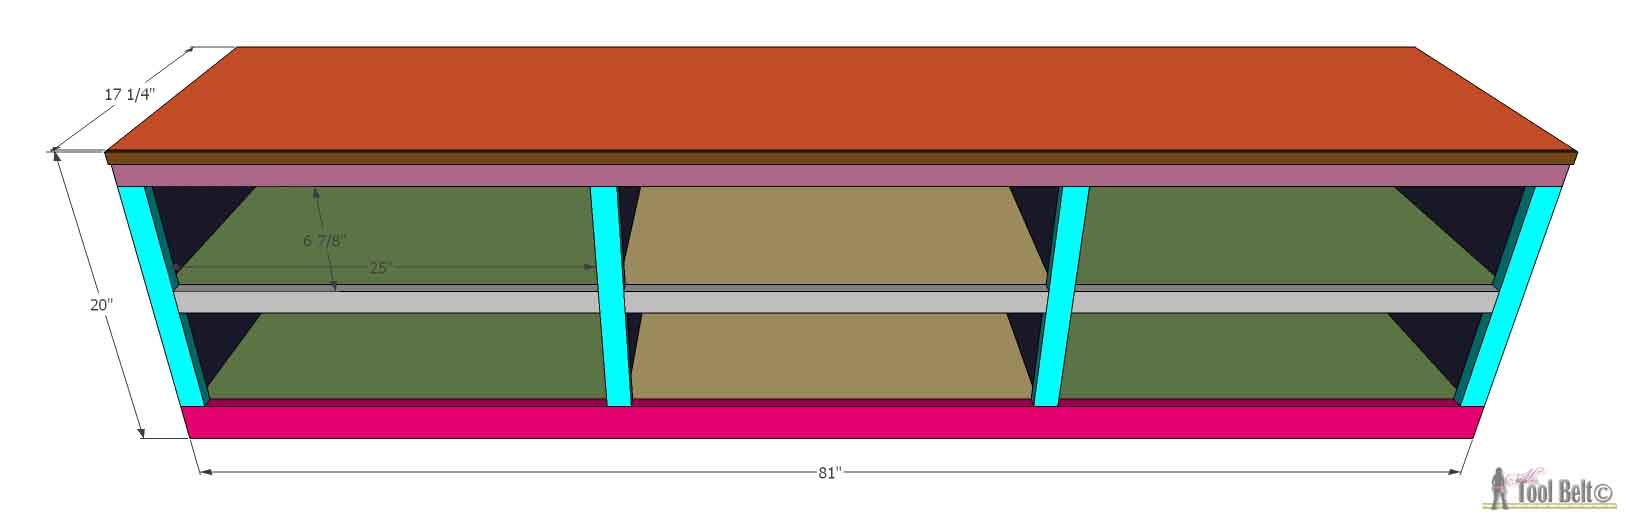 Shoe Shelf Bench With Pocket Holes Her Tool Belt